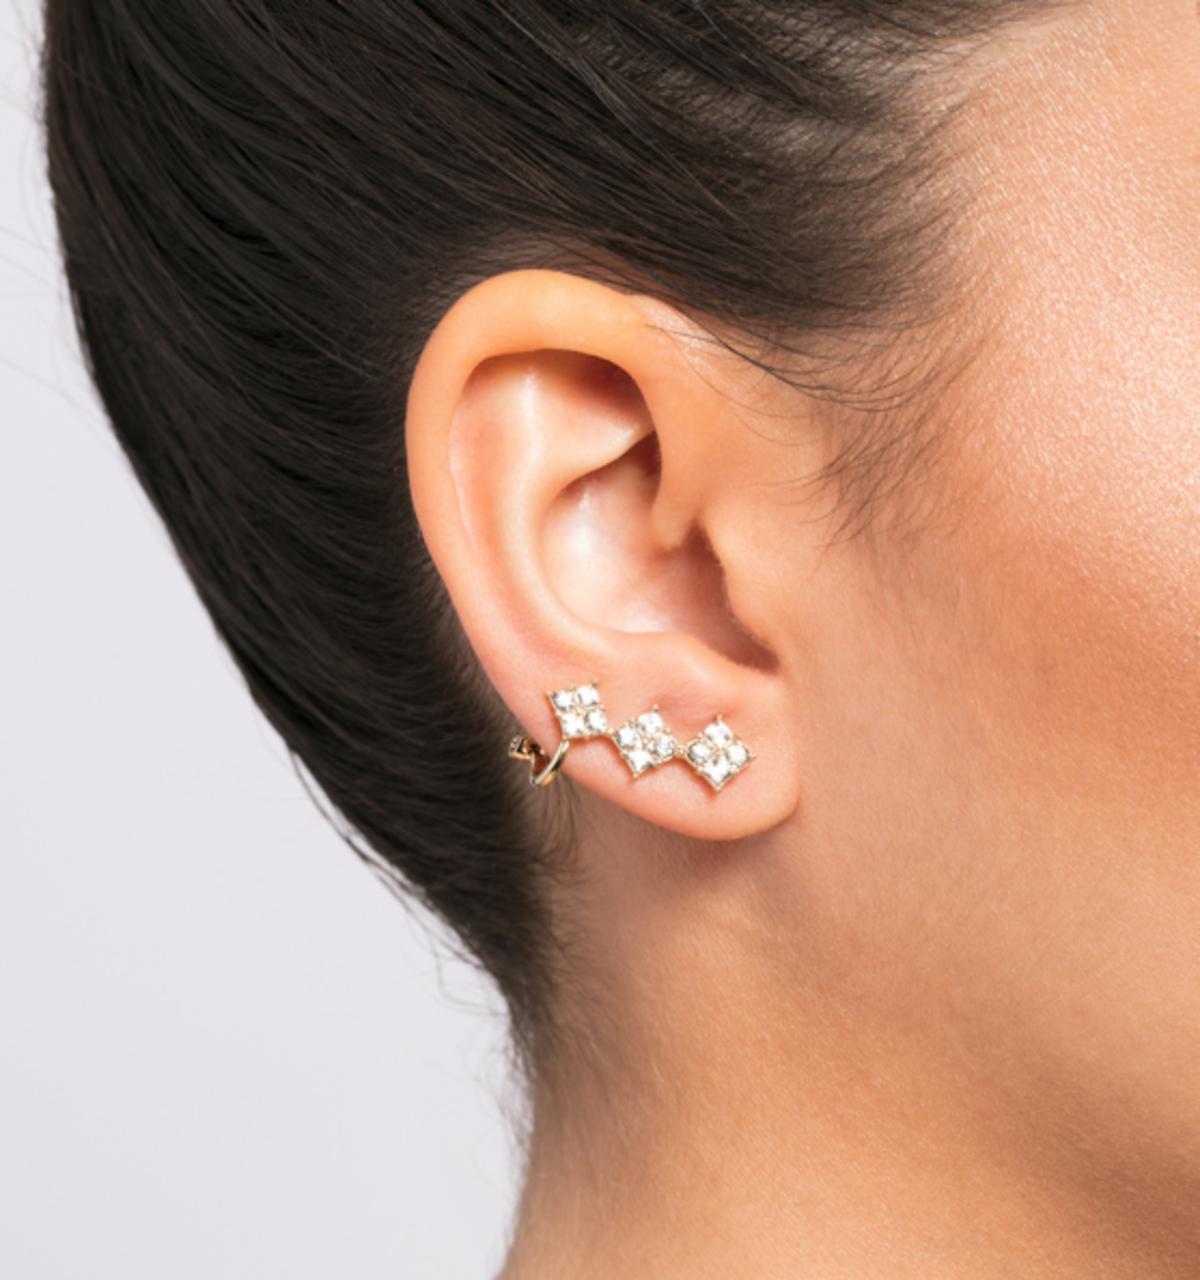 Soho social crawler earrings